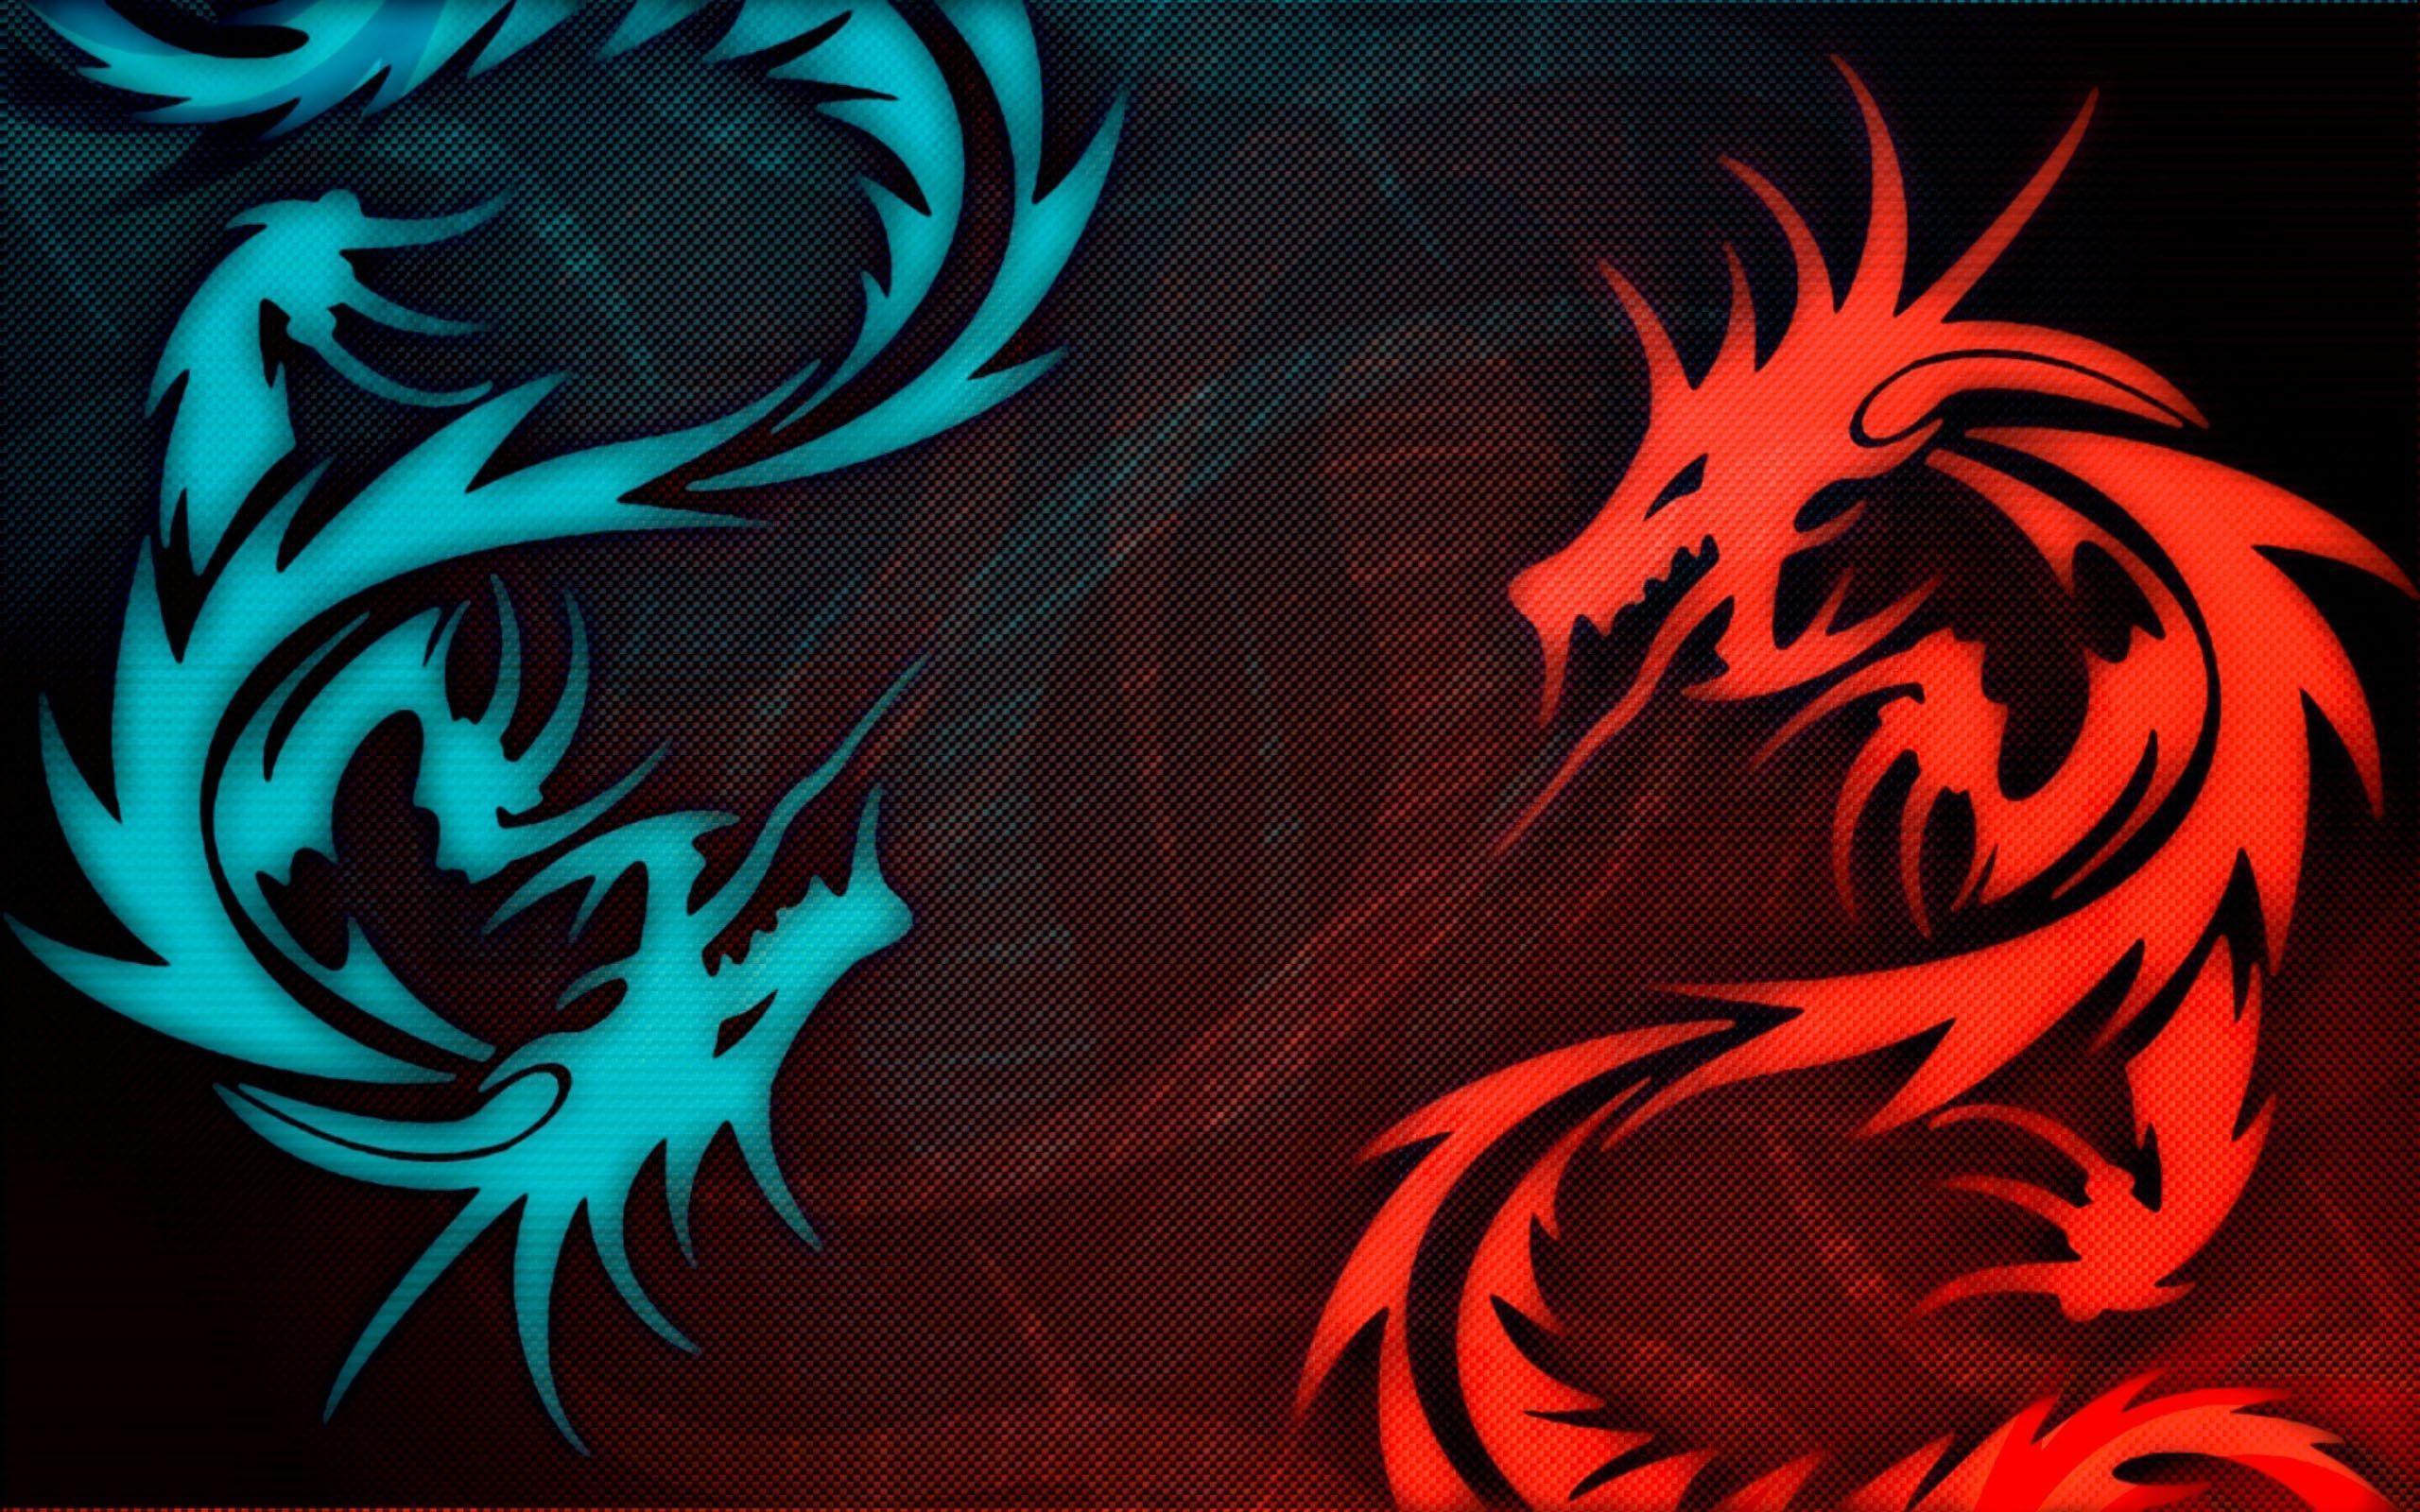 Transformers Wallpaper Hd Widescreen Dark Dragon Wallpapers Wallpaper Cave